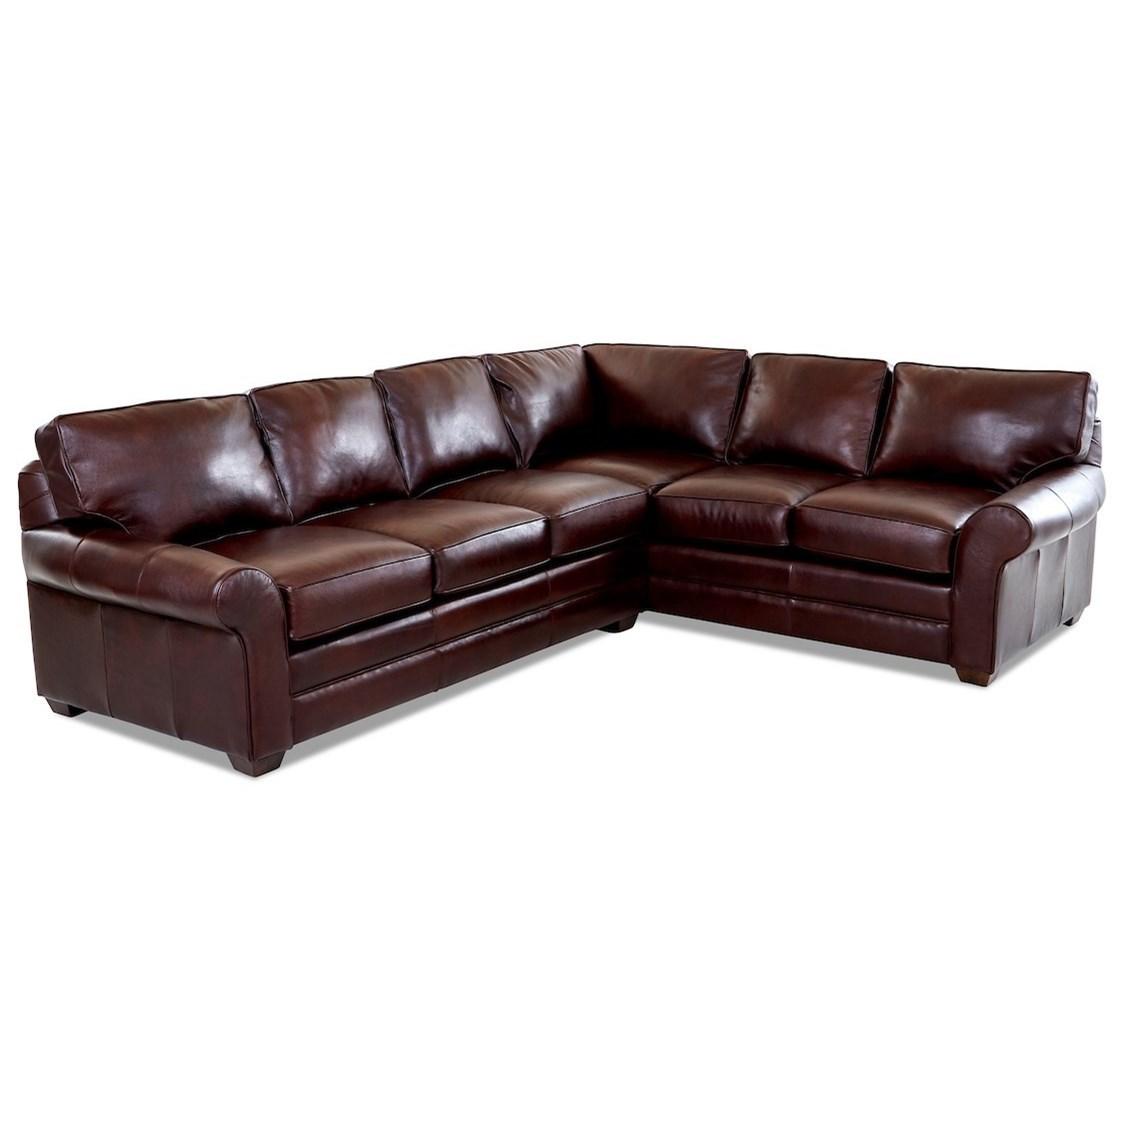 Casual 2 Pc Leather Sectional Sofa w/ LAF Sofa